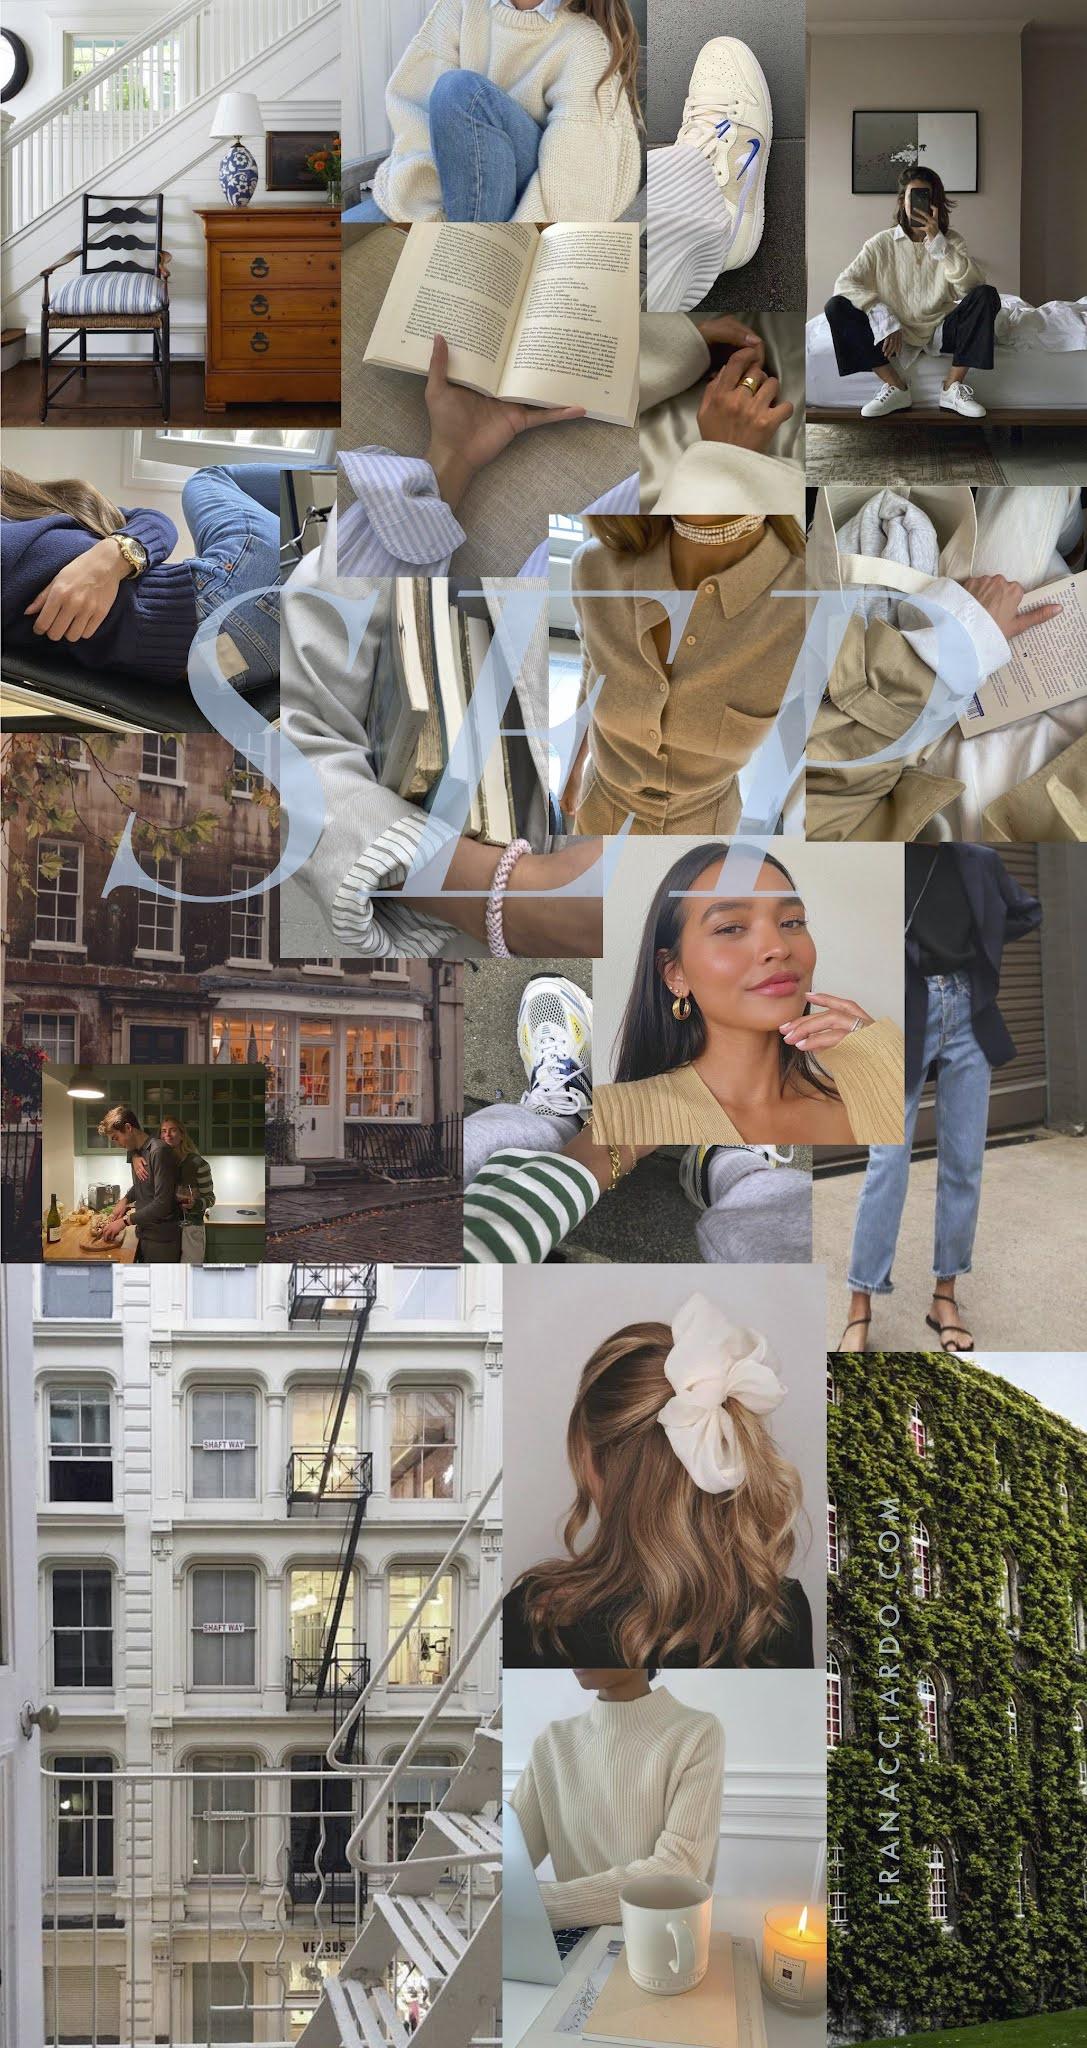 fran acciardo 2021 September Mood Board (Desktop + iPhone Wallpaper)